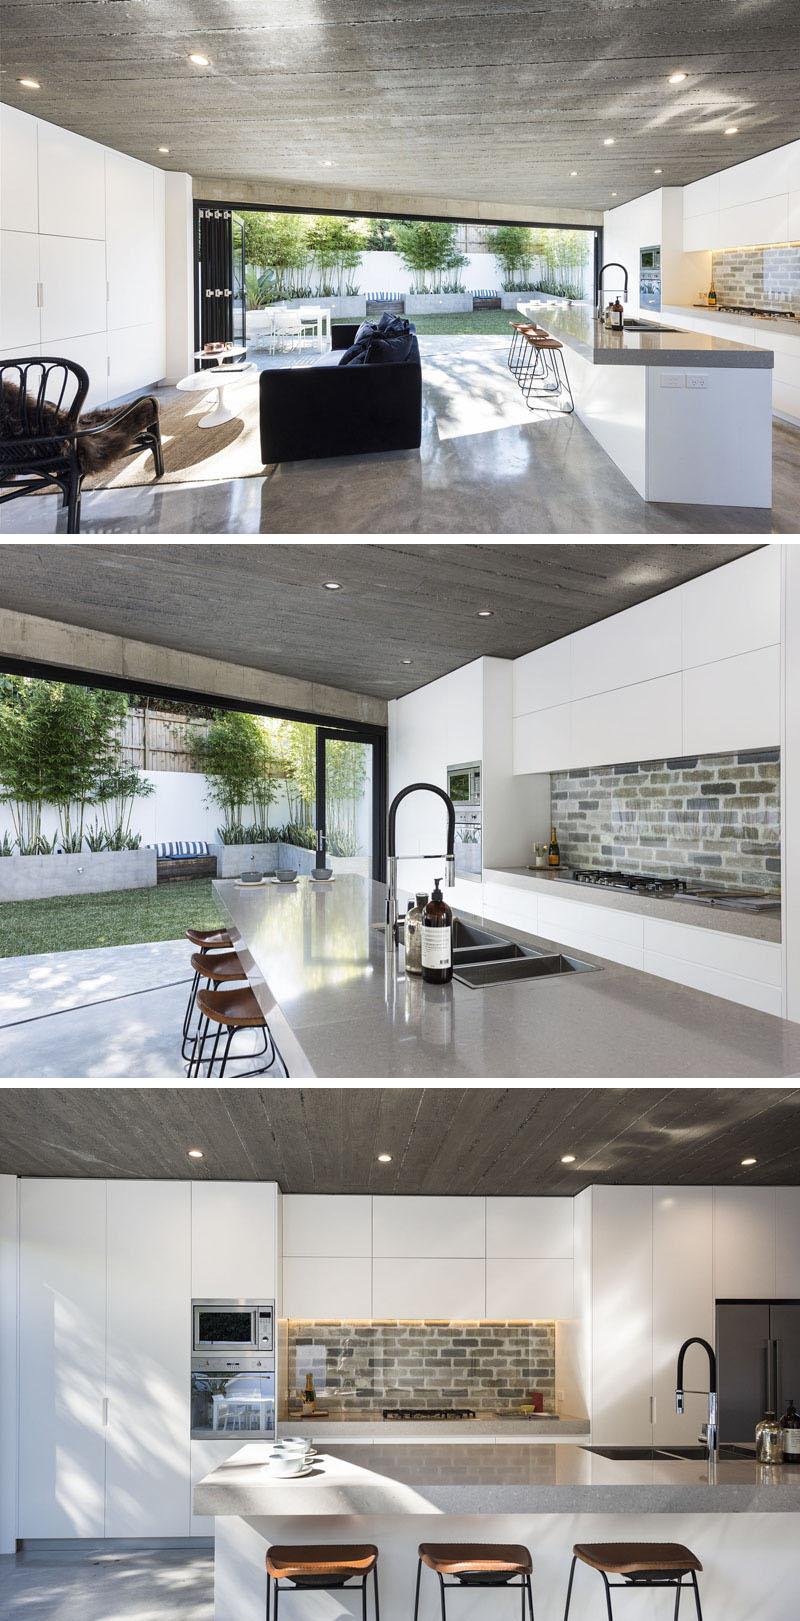 Modern White Kitchen Glass Brick Backsplash 300817 536 06 - Wood-backsplash-exterior